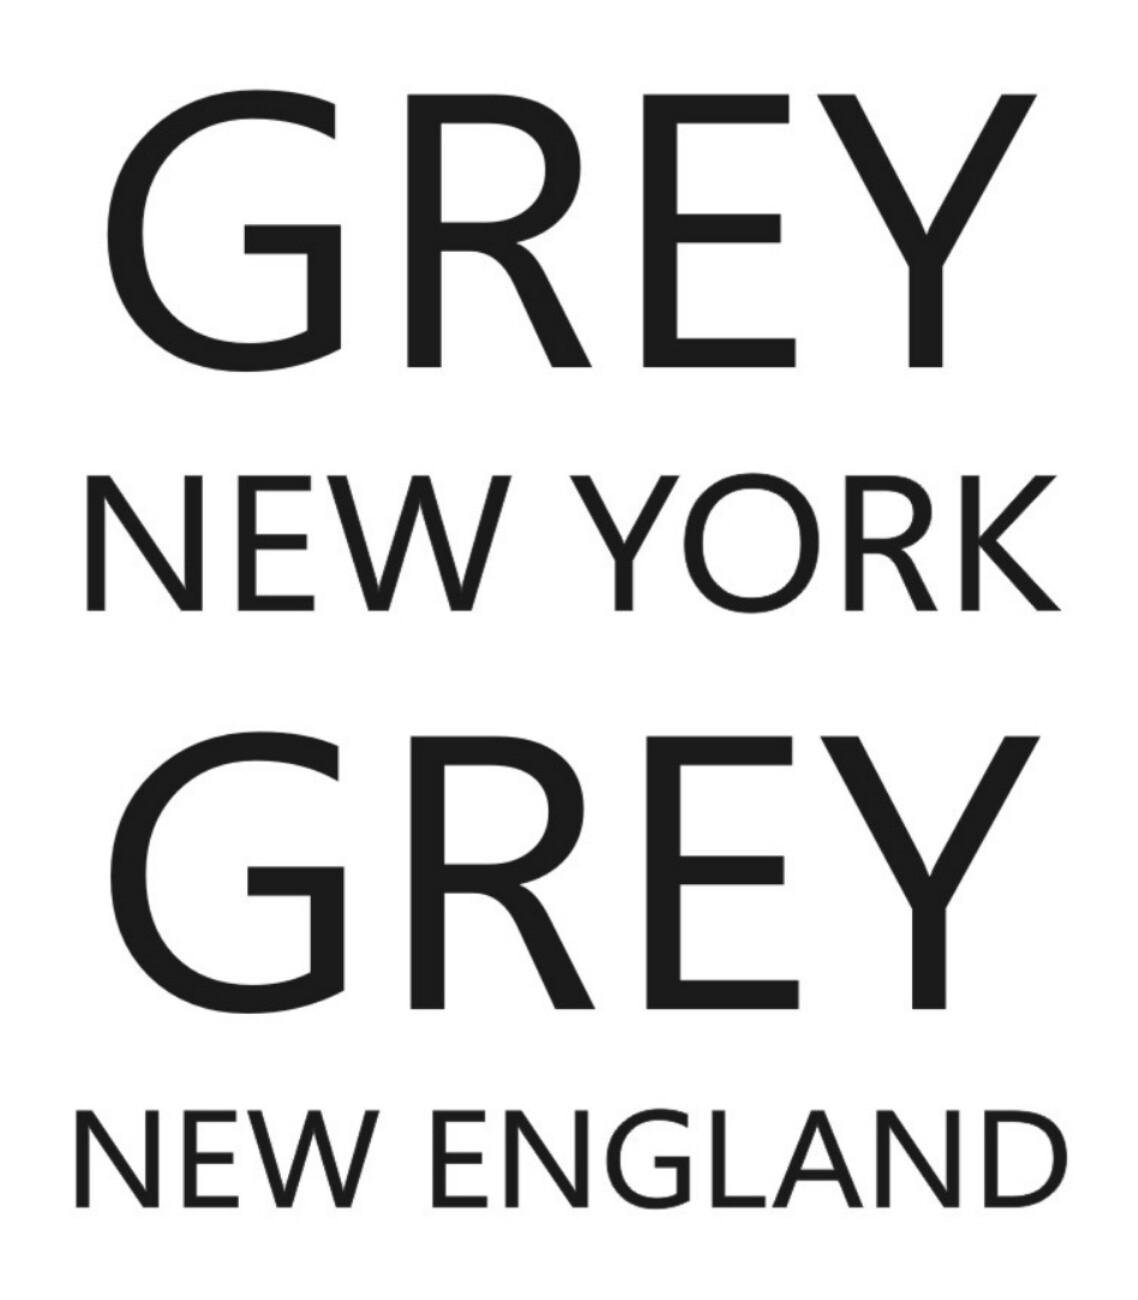 Grey New York Grey New England Vouchers